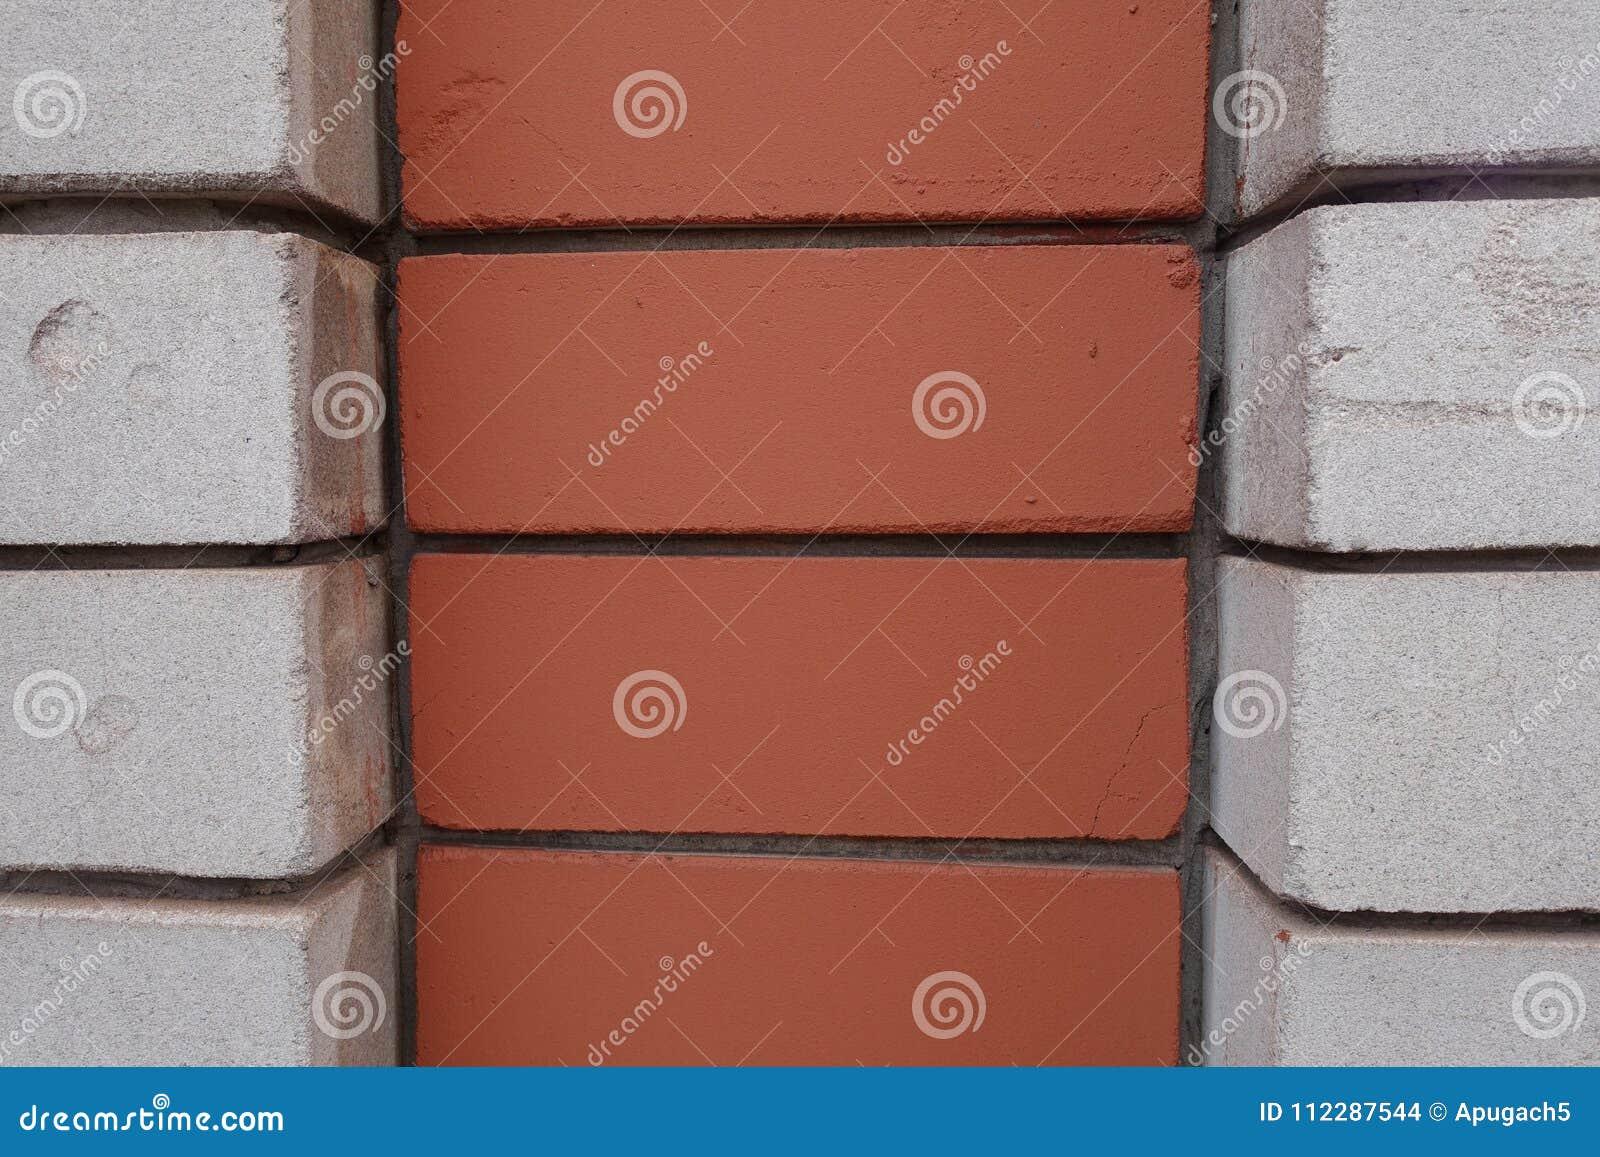 Alvenaria decorativa feita dos tijolos brancos e alaranjados